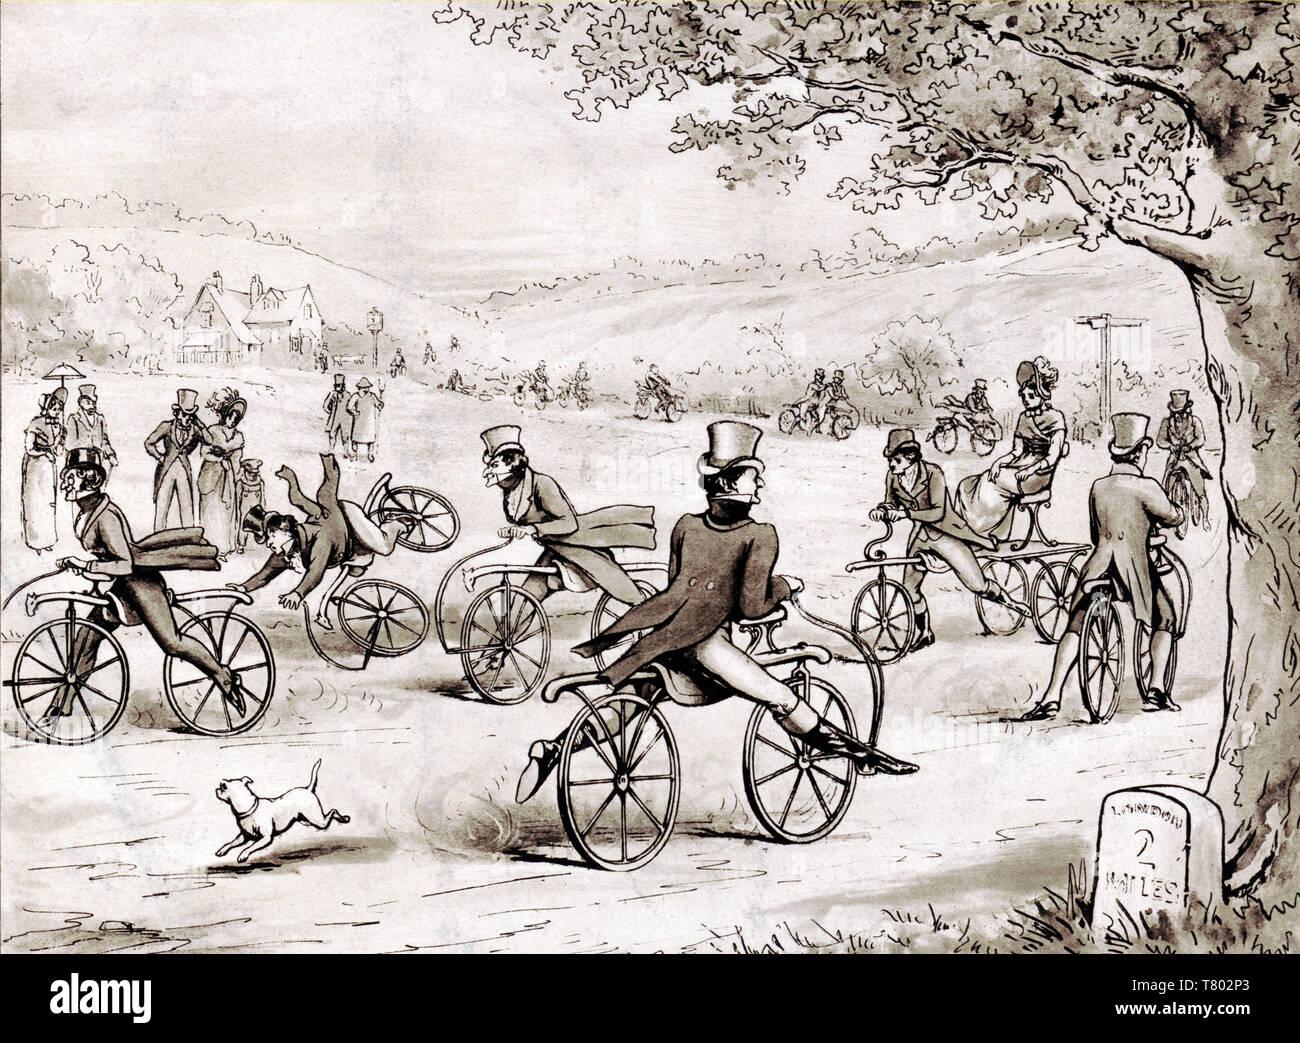 Dandies Riding Velocipedes, 1819 - Stock Image